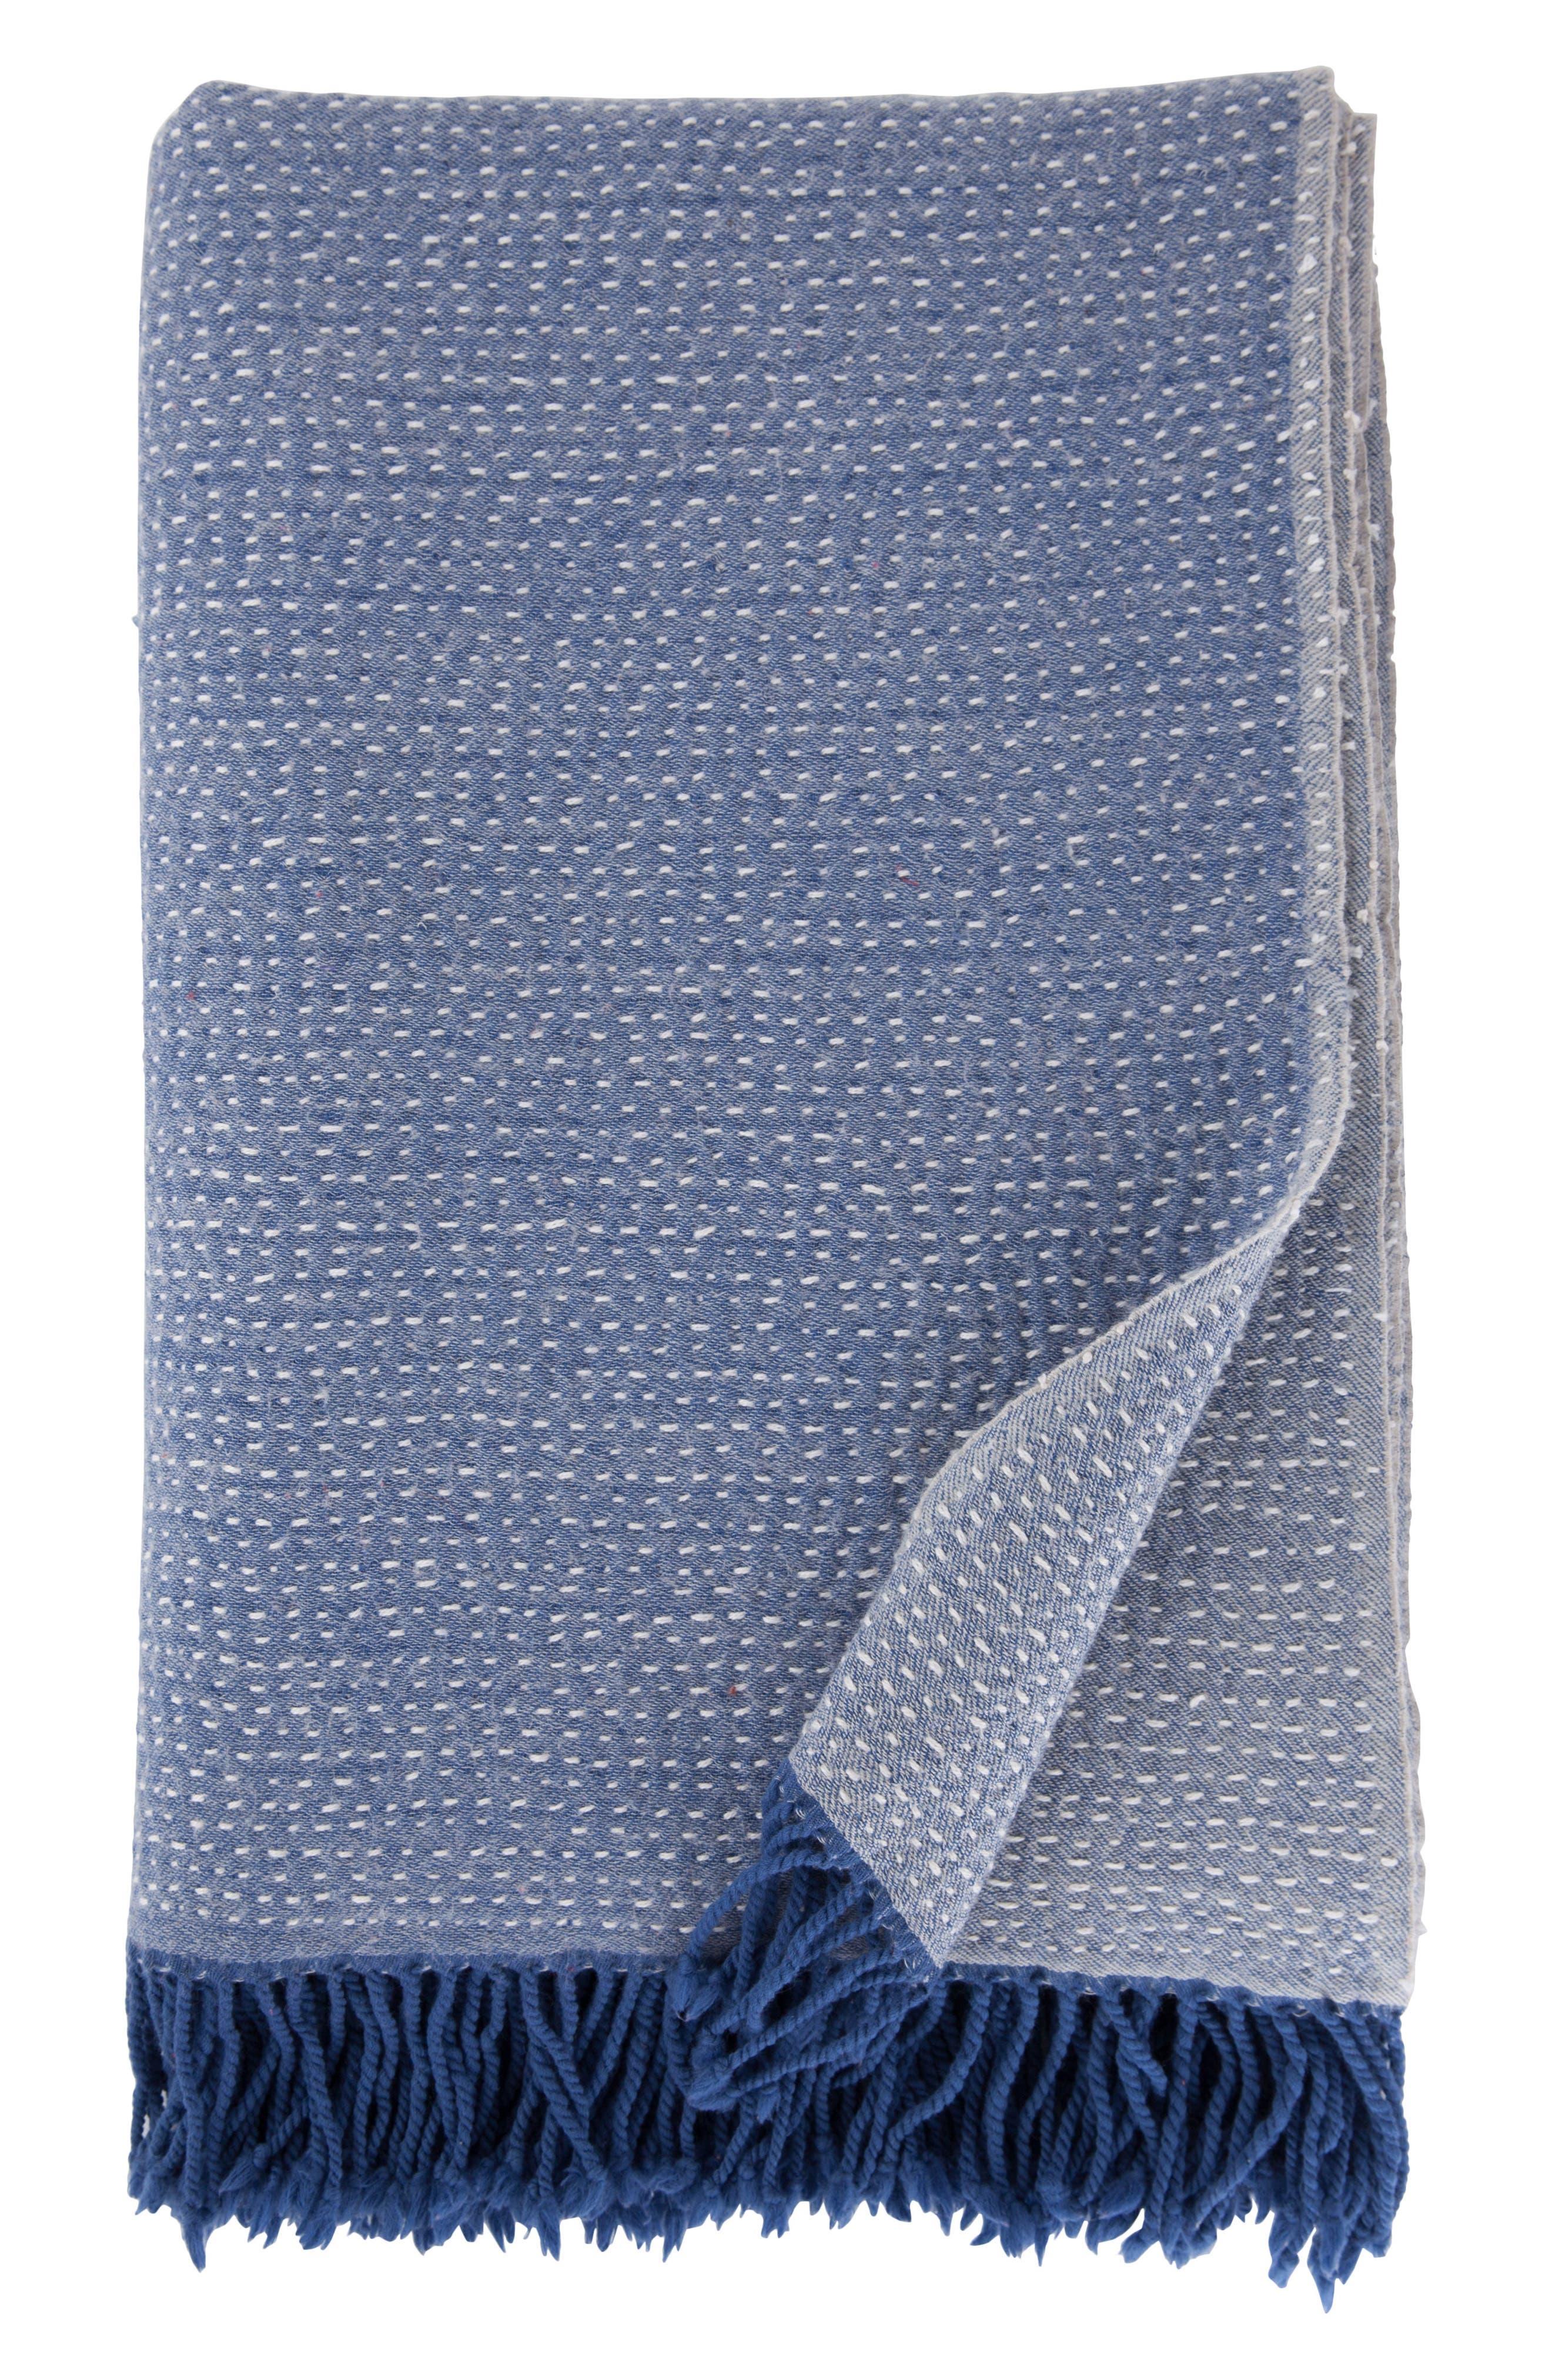 Hand Embroidered Merino Wool Blanket,                             Main thumbnail 1, color,                             CHAMBRAY